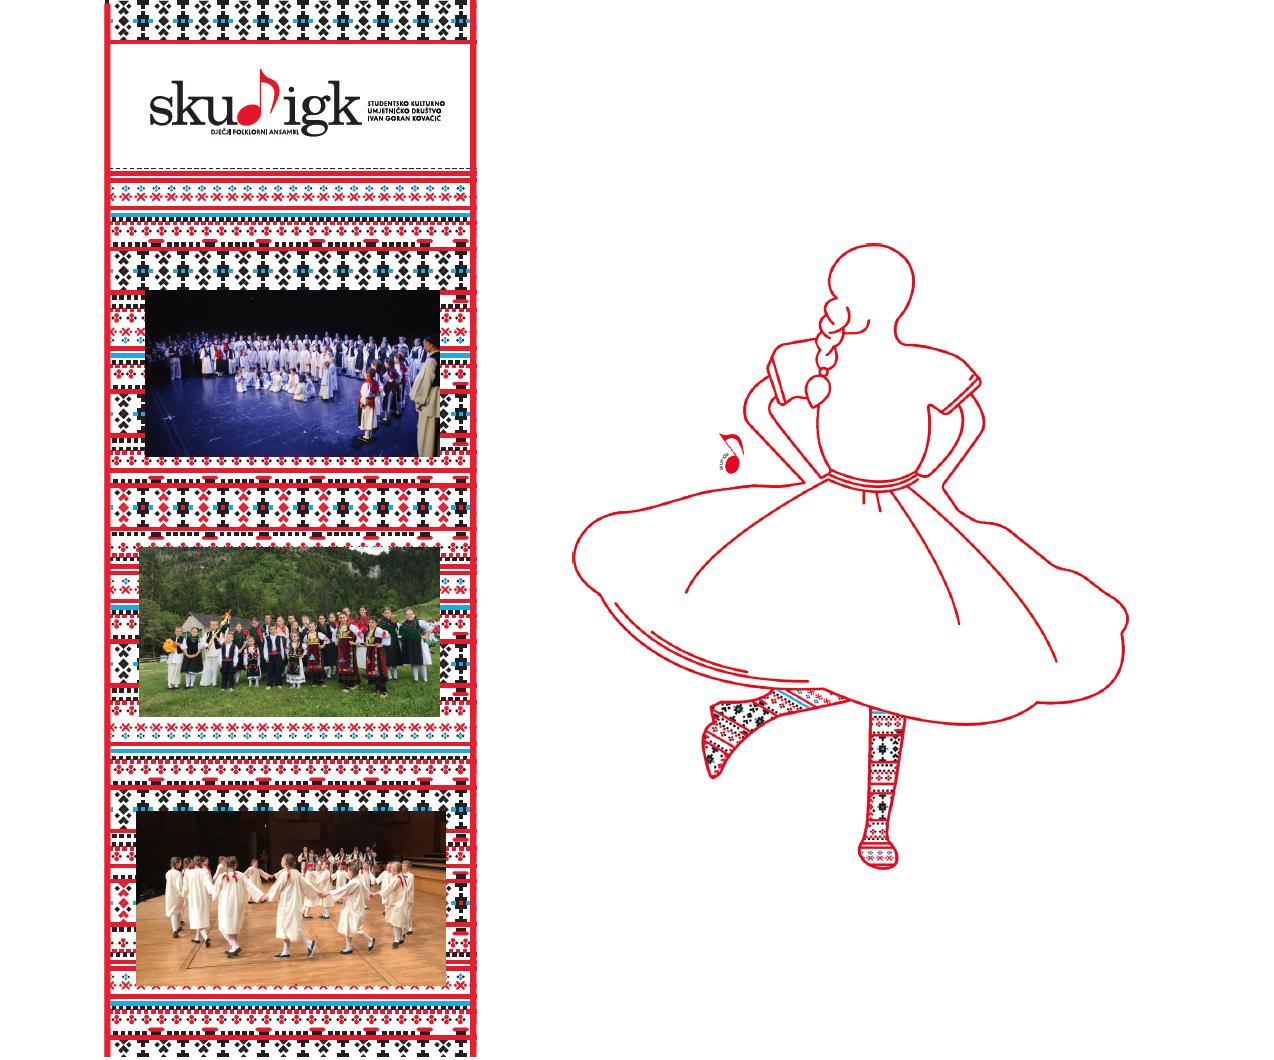 Primanje članova u Dječji folklorni ansambl: Rujan / Listopad